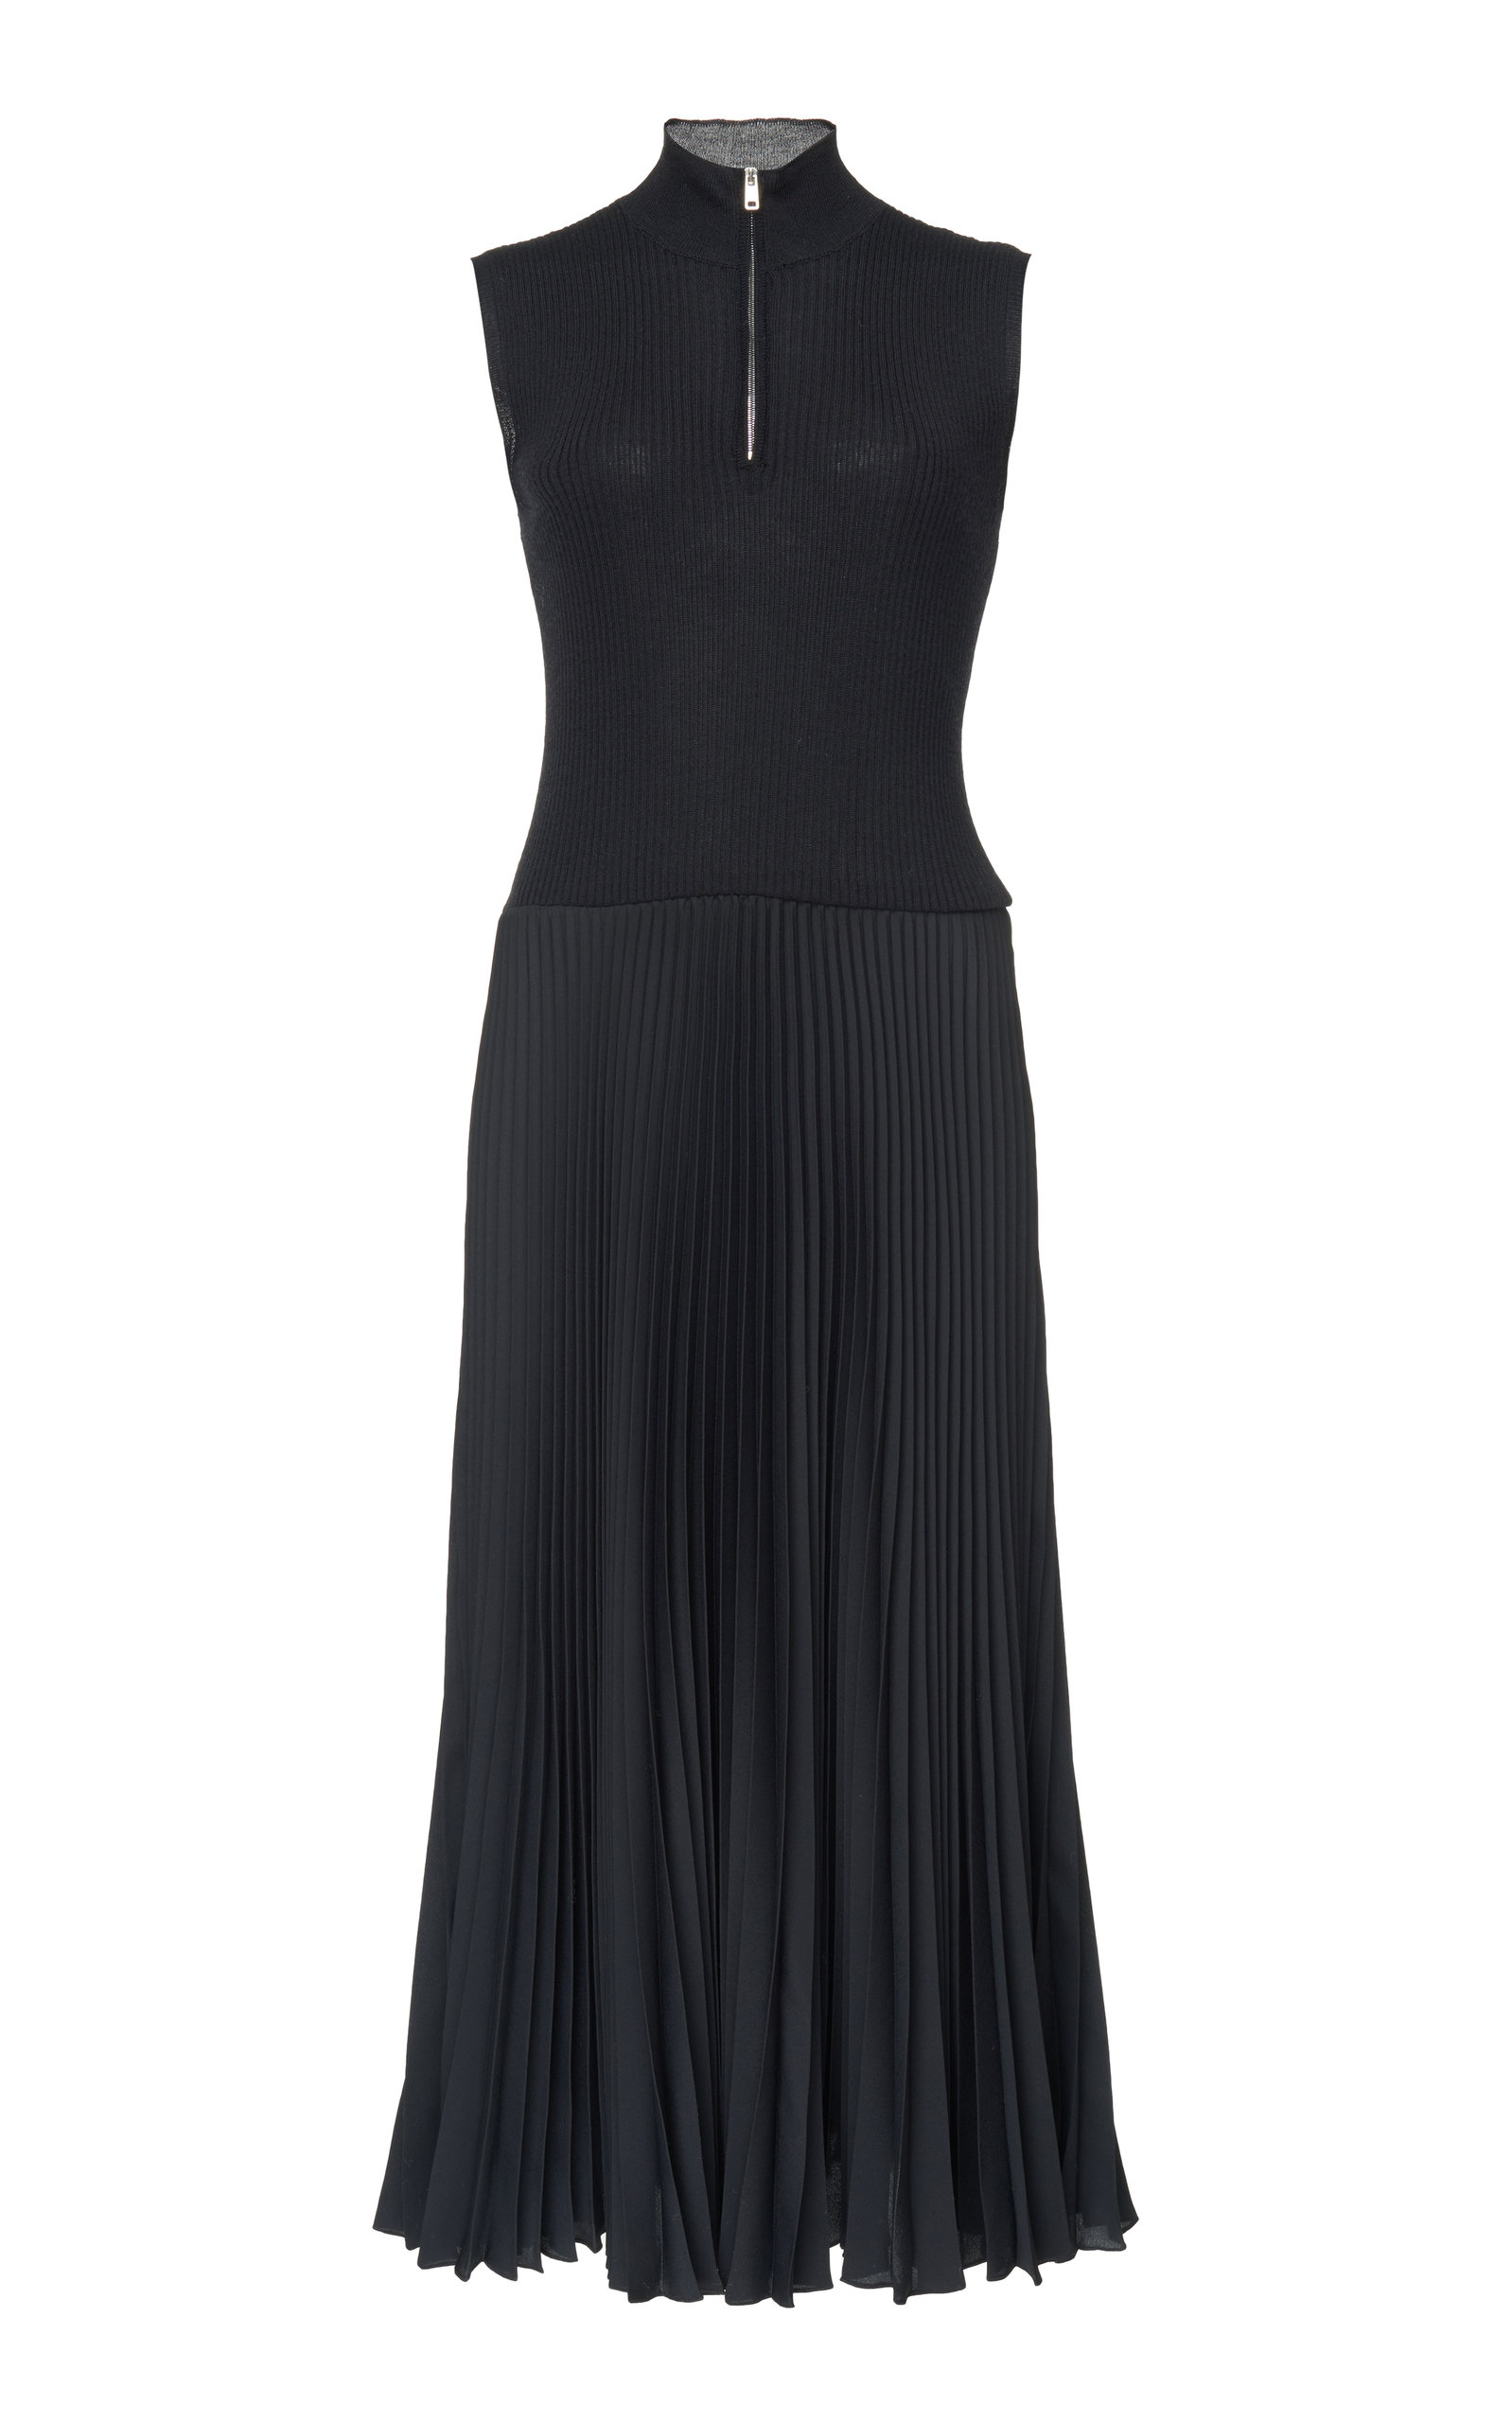 Zip High-Neck Sleeveless Pleated Skirt Midi Dress in Black